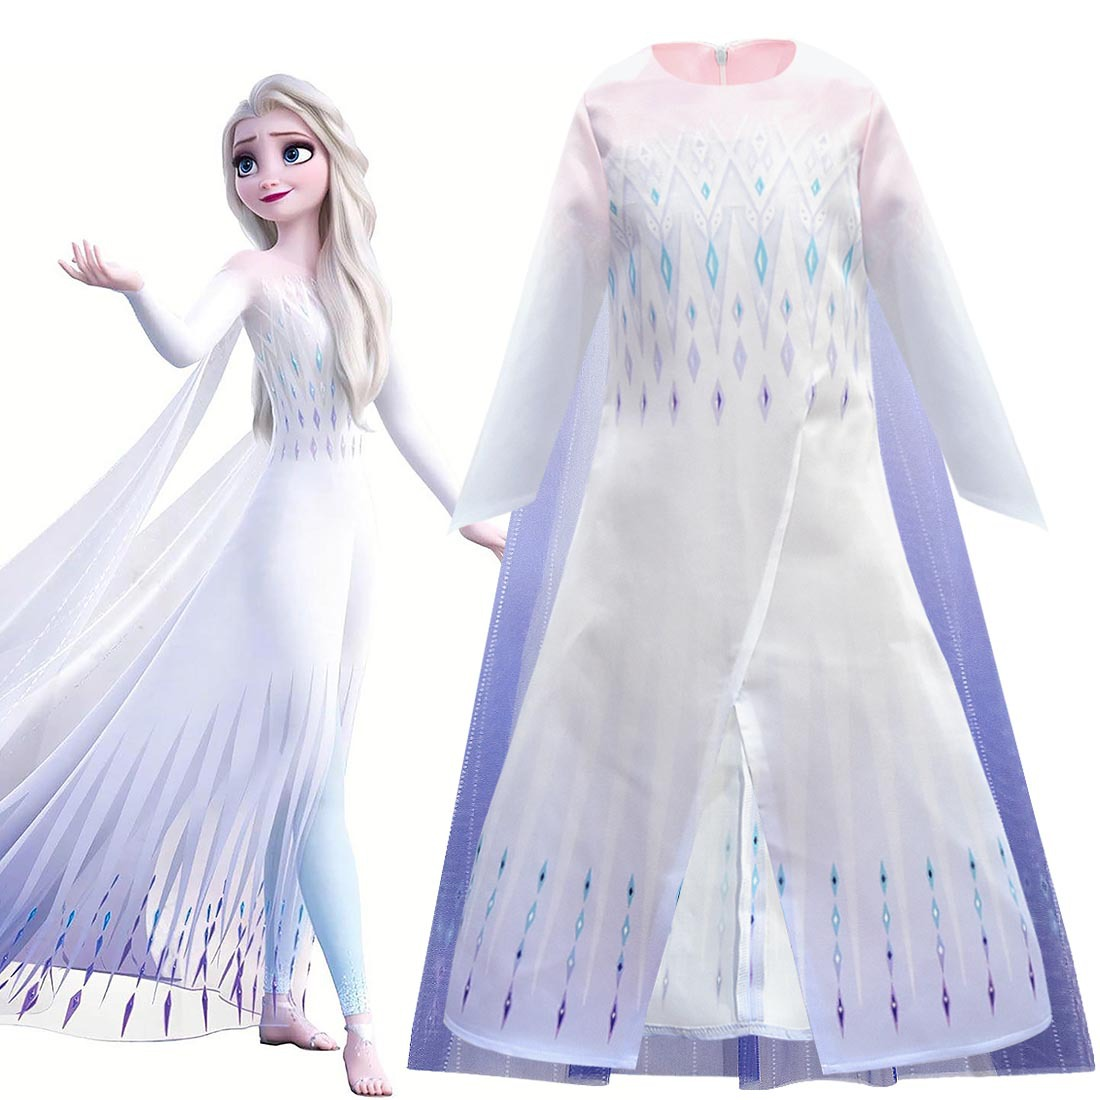 Frozen 2 Elsa Dress Baby Girls Princess Dress Anna Elsa Cosplay Costume Long Sleeve Girl Princess Dress Birthday Party Dresses